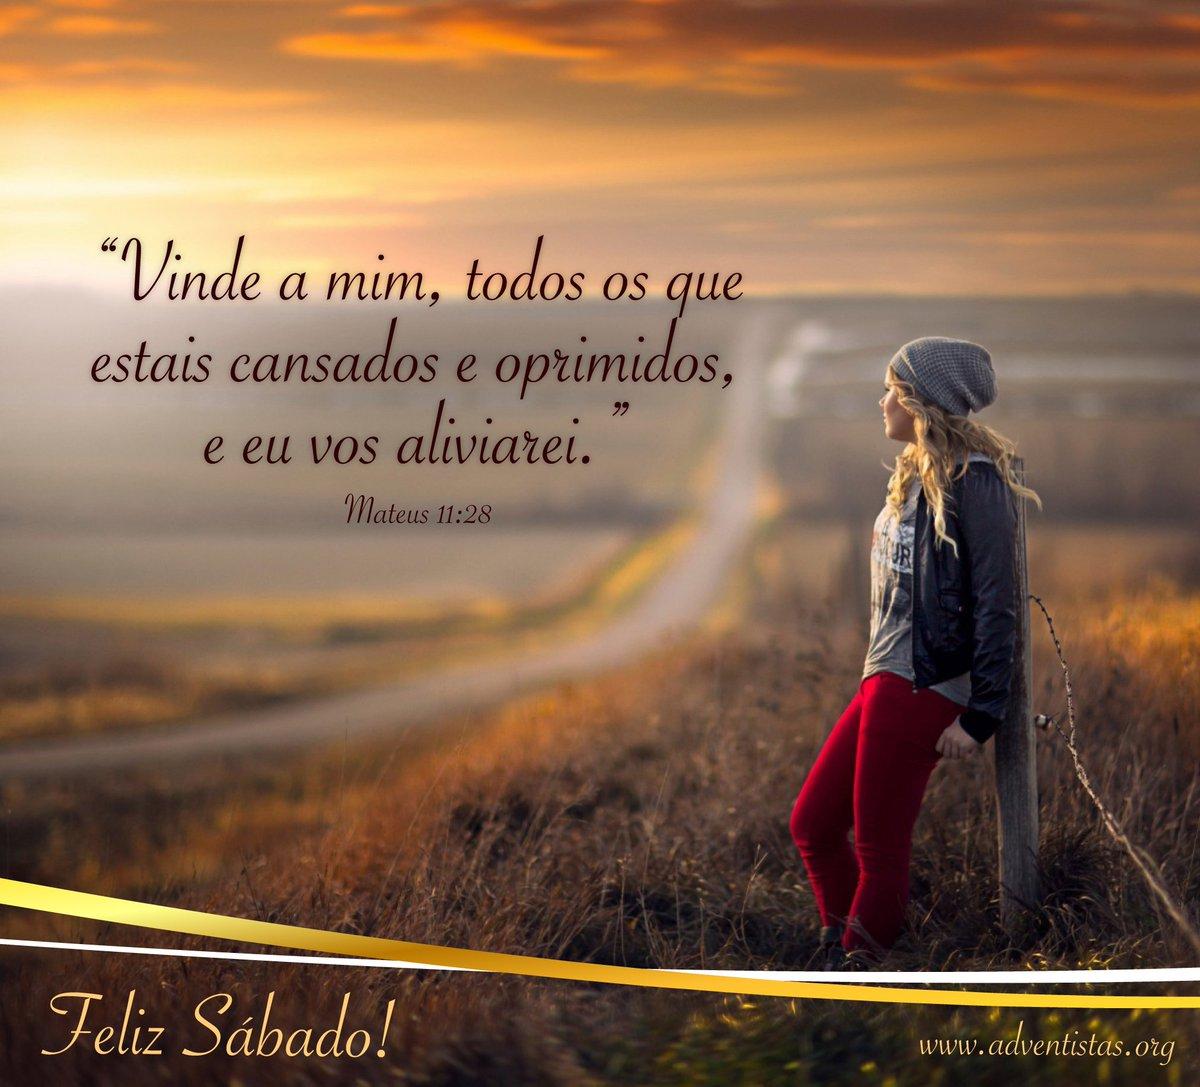 Adventistas Brasil On Twitter Descanse Em Jesus E Tenha Um